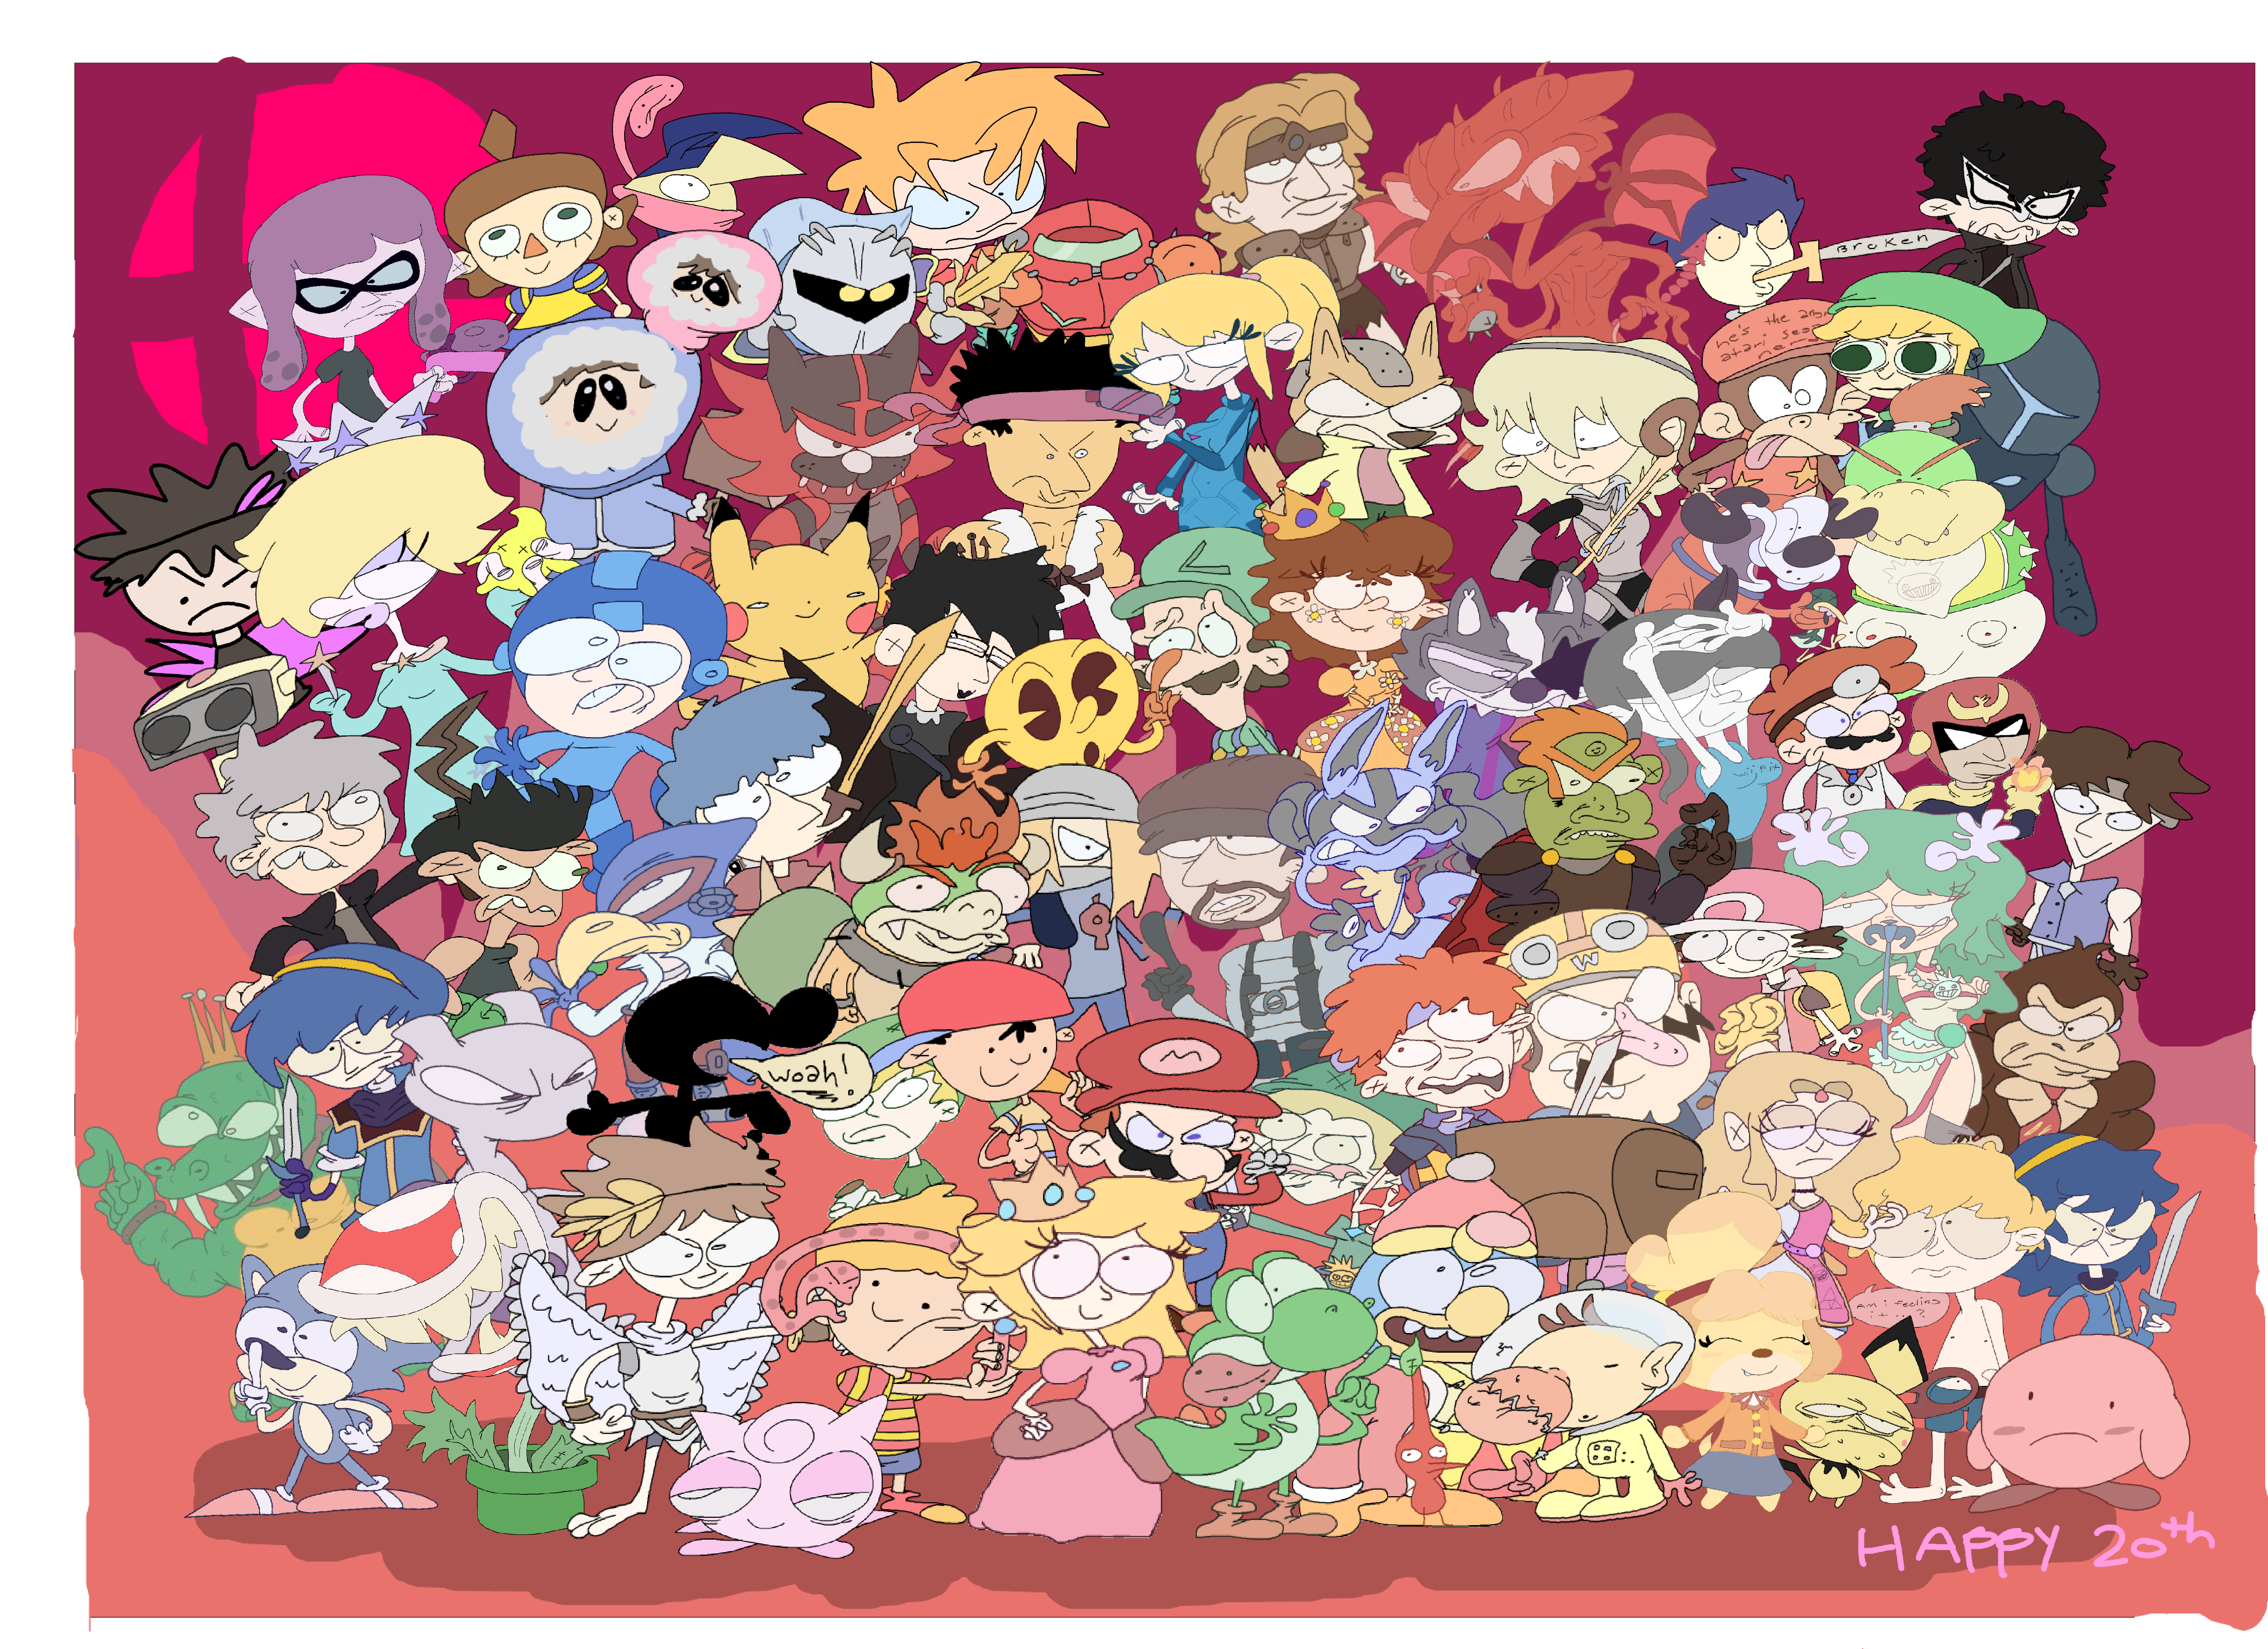 20 Yrs of Smash Bros